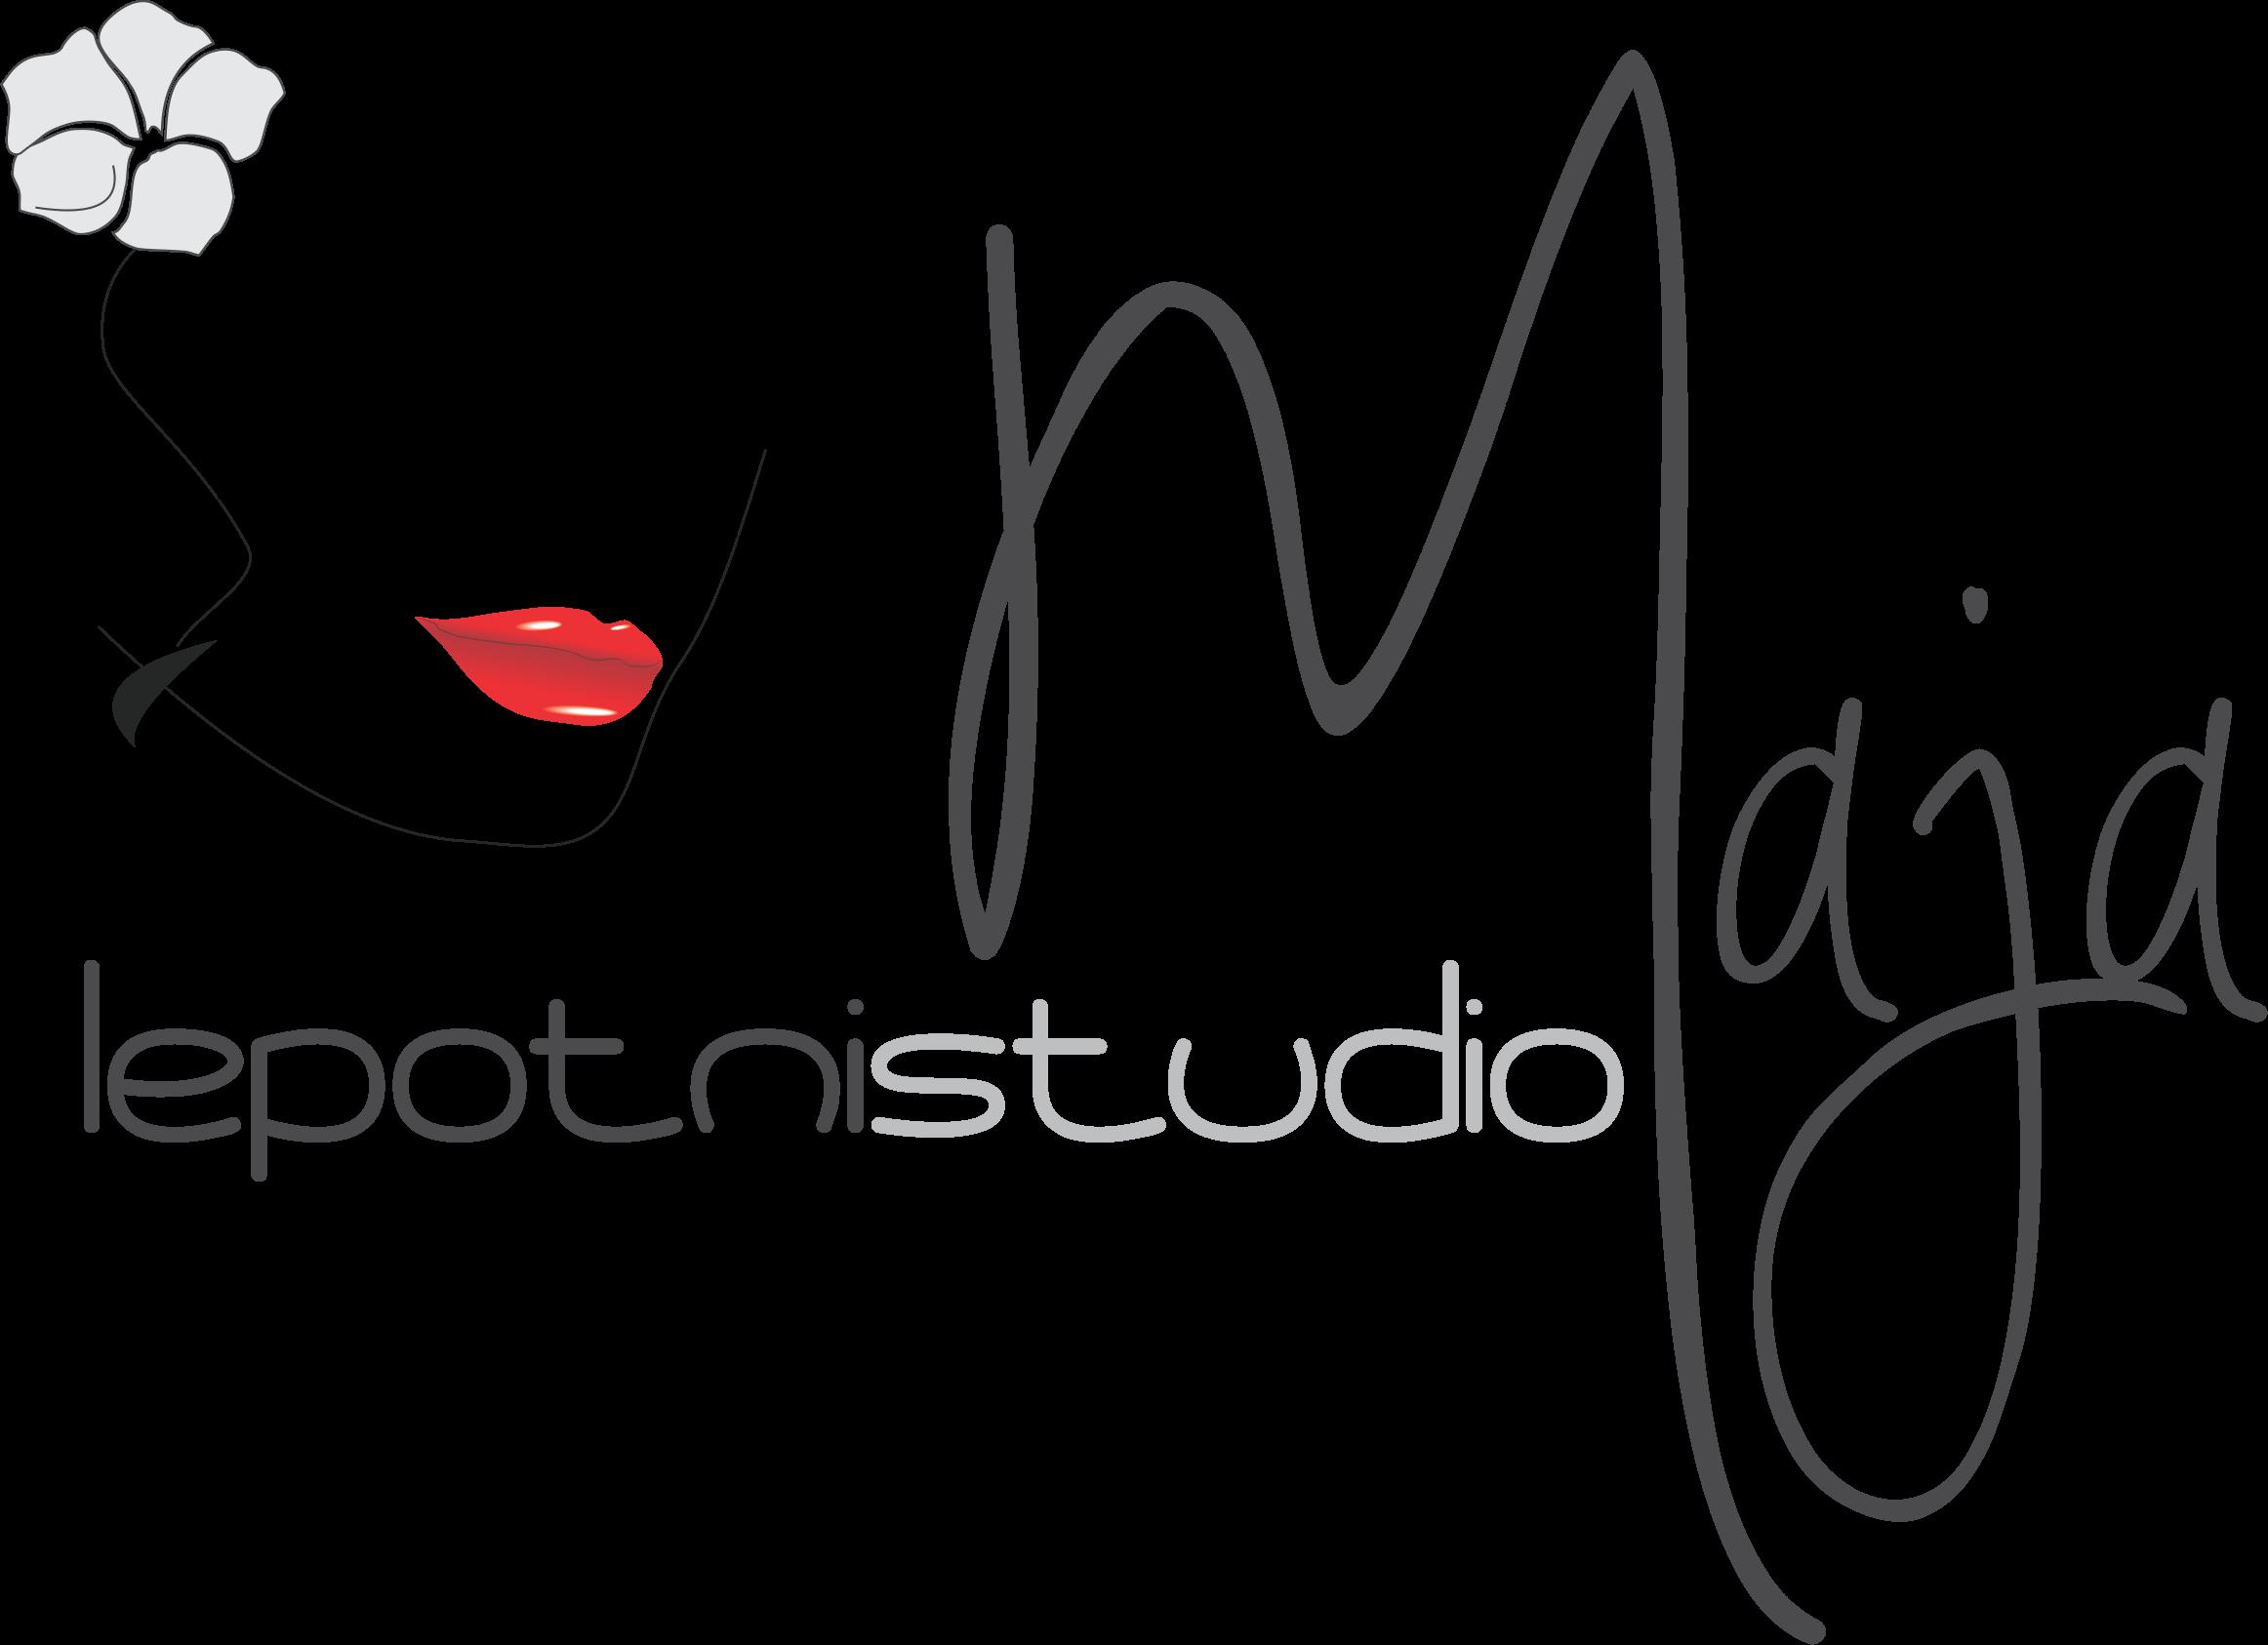 Lepotni studio Maja Maja Vervega s.p.